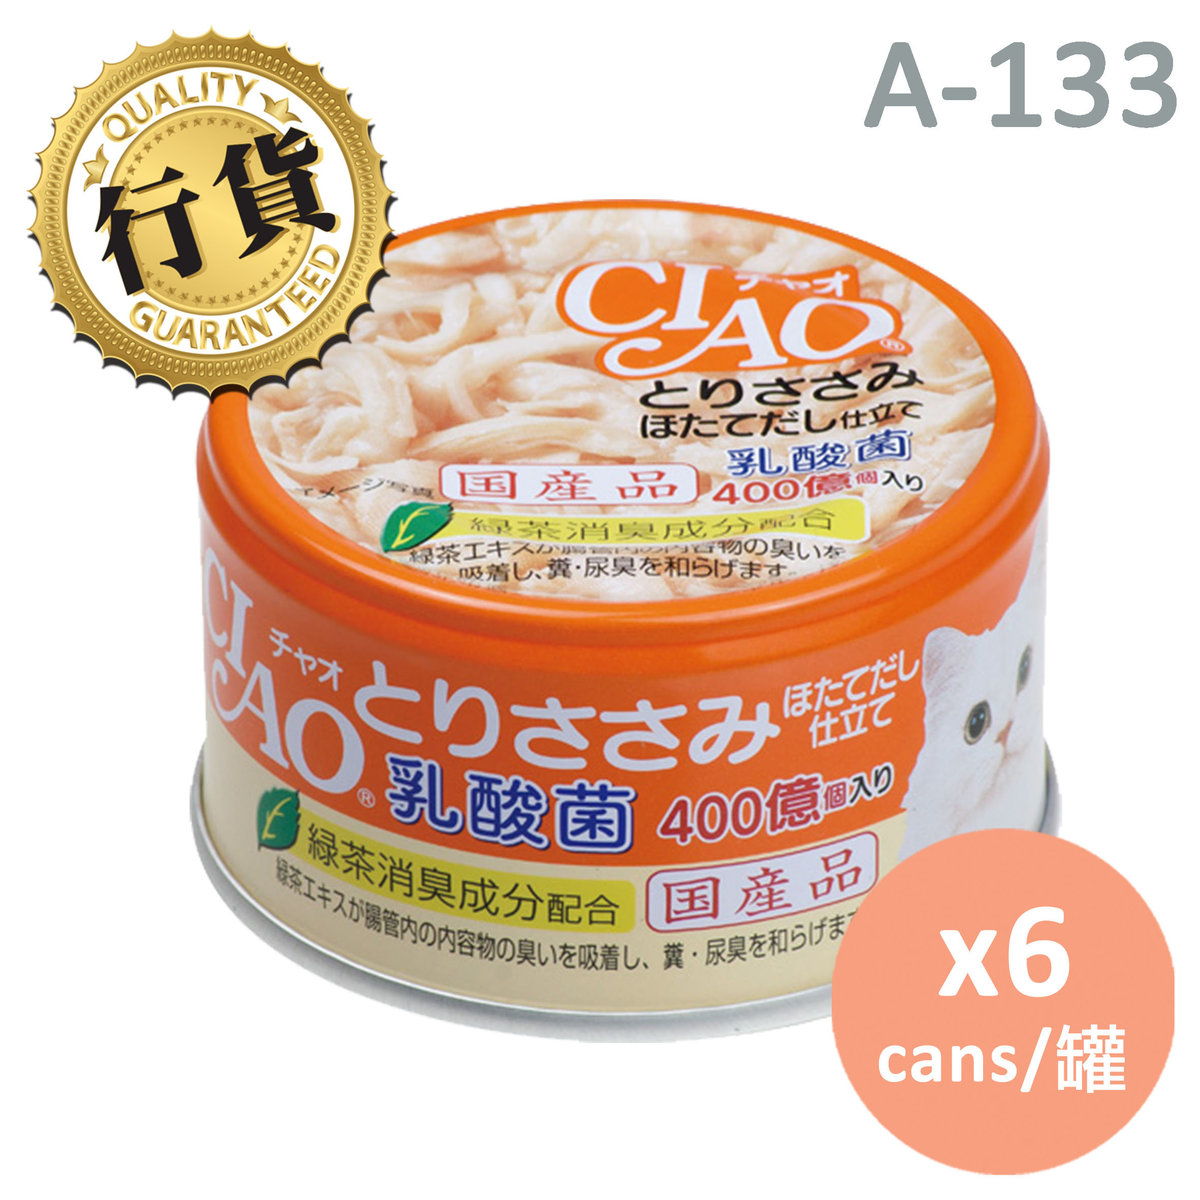 CIAO Lactobacillus Maguro Scallop Soup A-133 x6